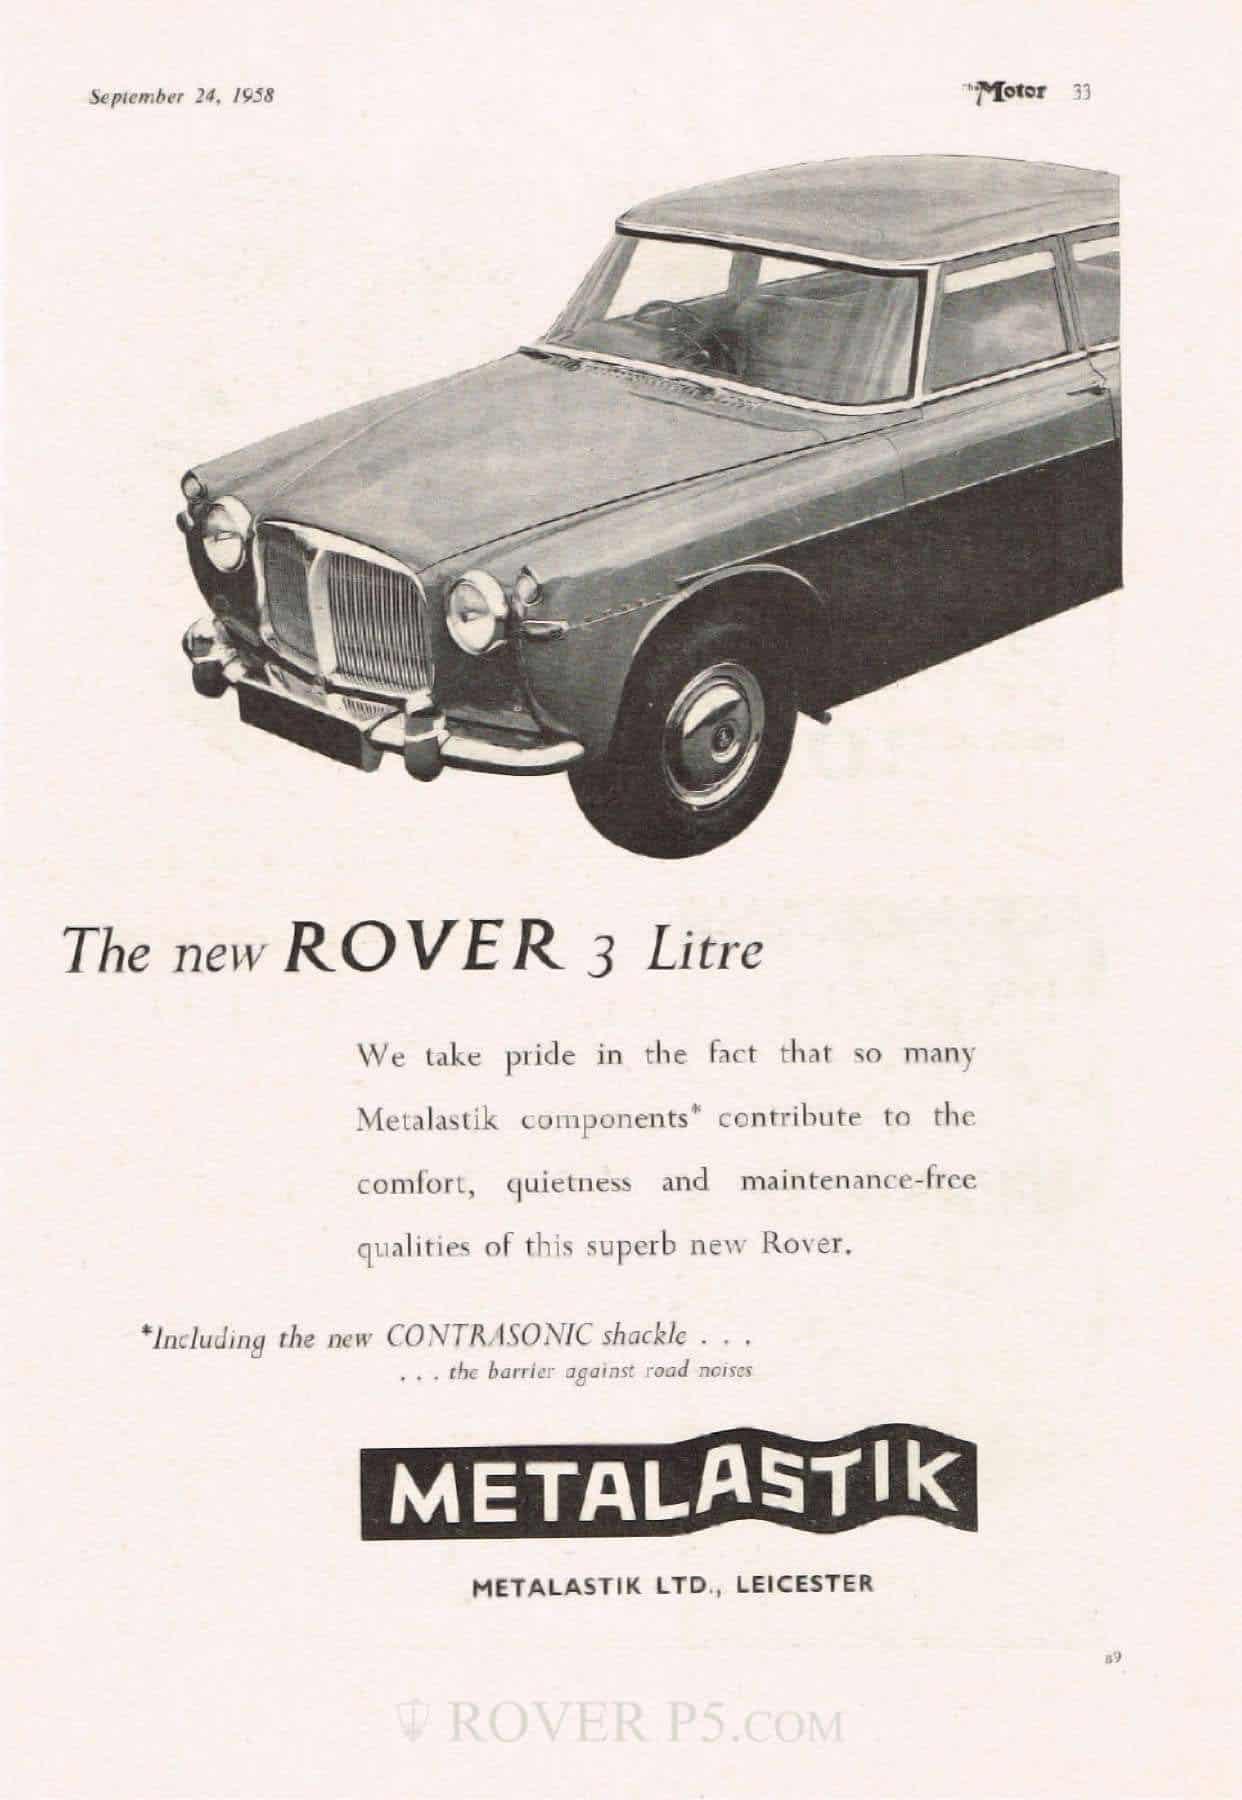 Advert - Metalastik Contrasonic Shackle